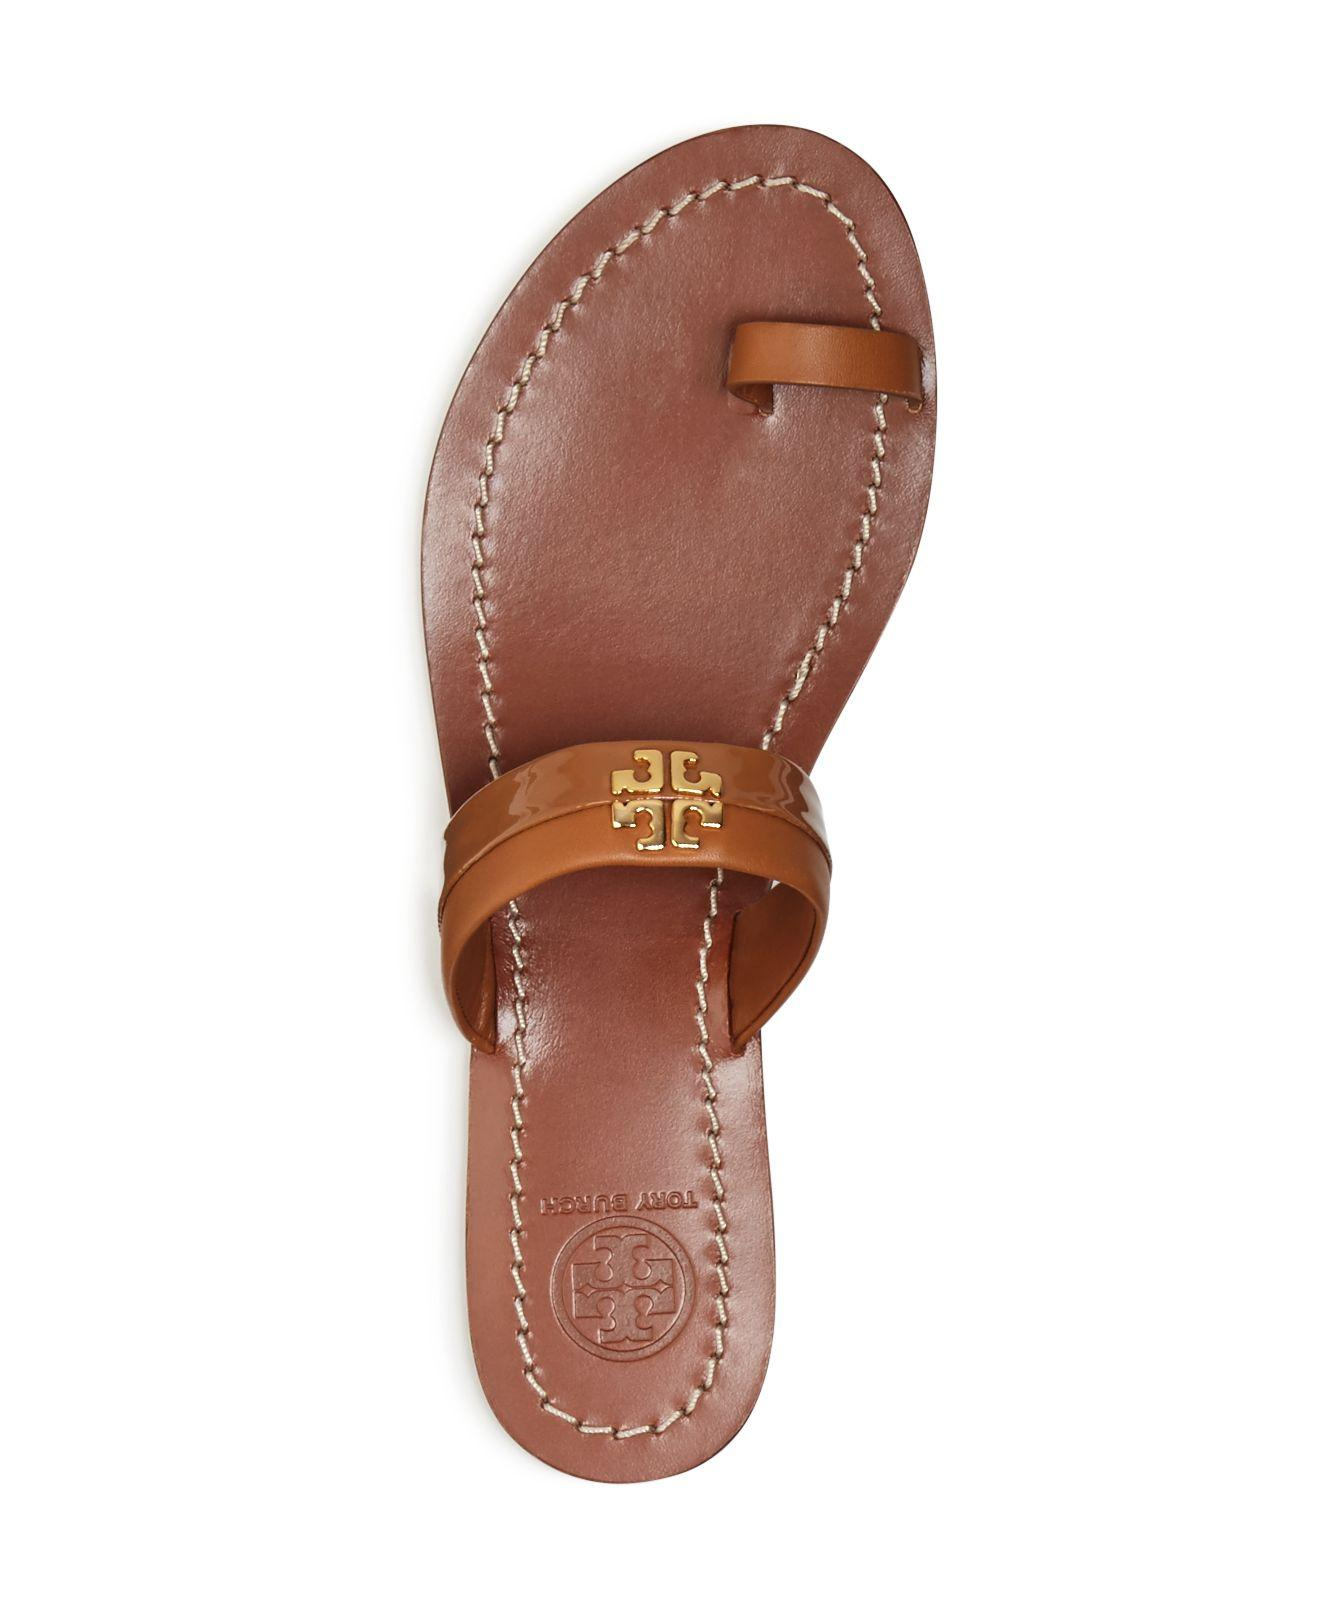 75a4af01e6c2 Lyst - Tory Burch Jolie Toe Ring Sandals in White